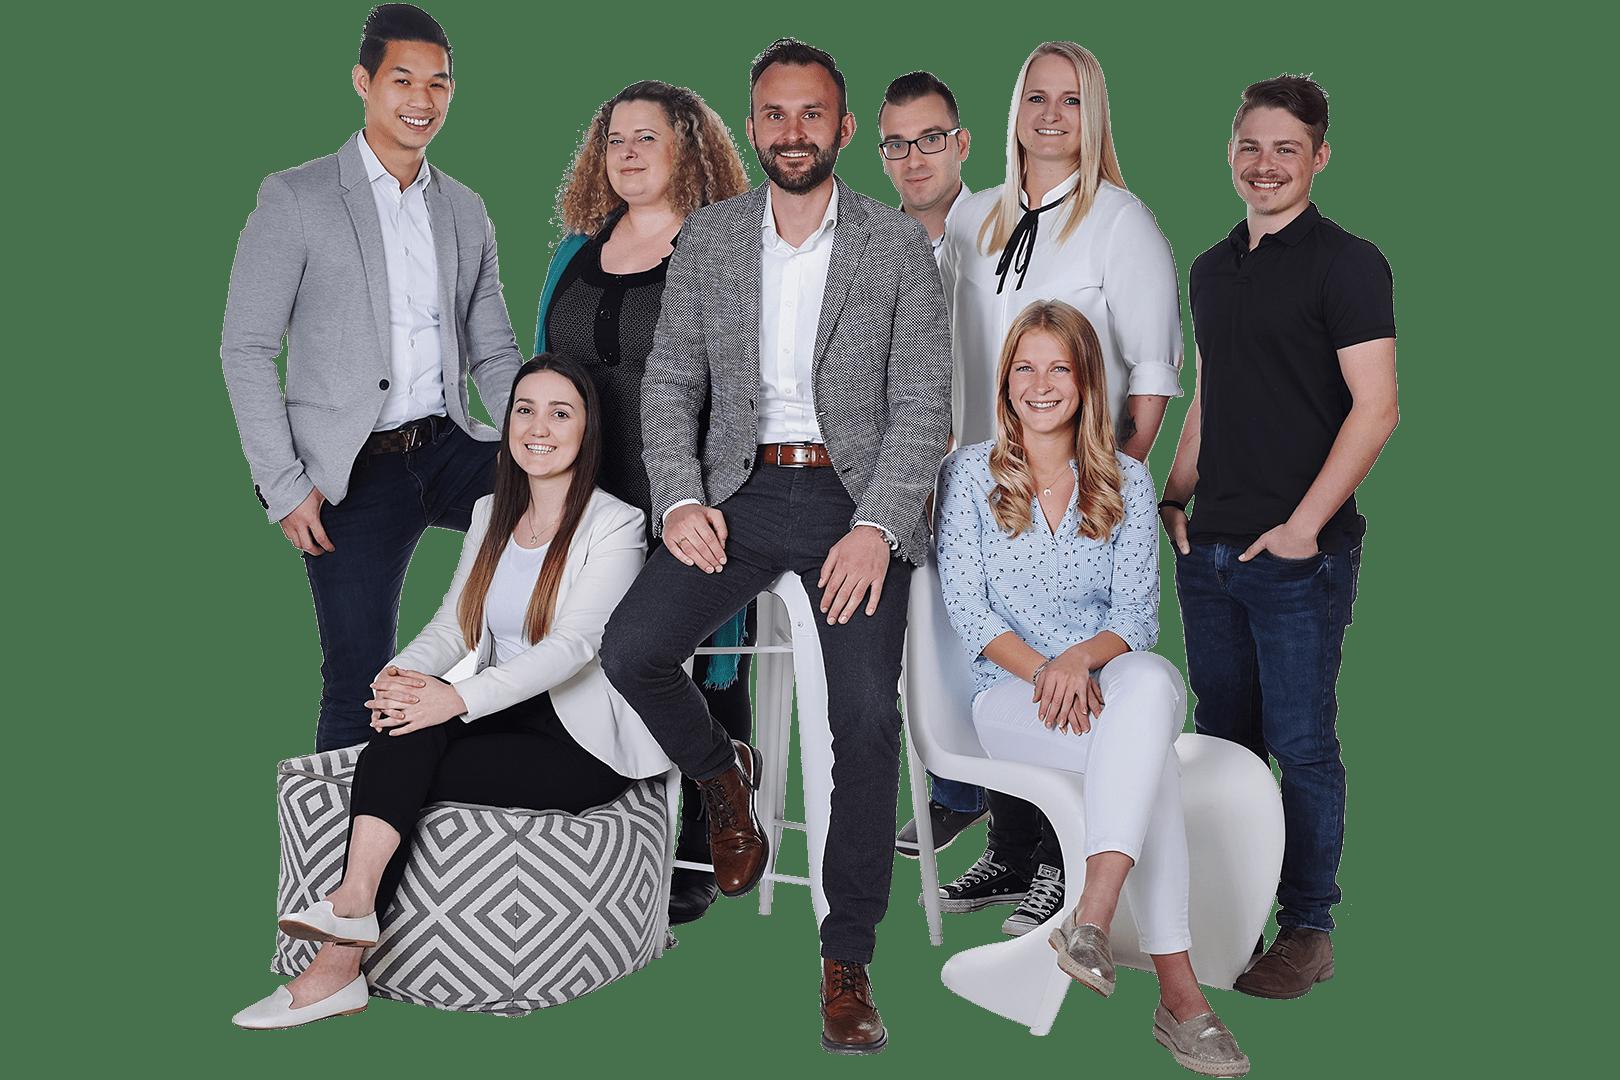 Krassgruen-Team-2019